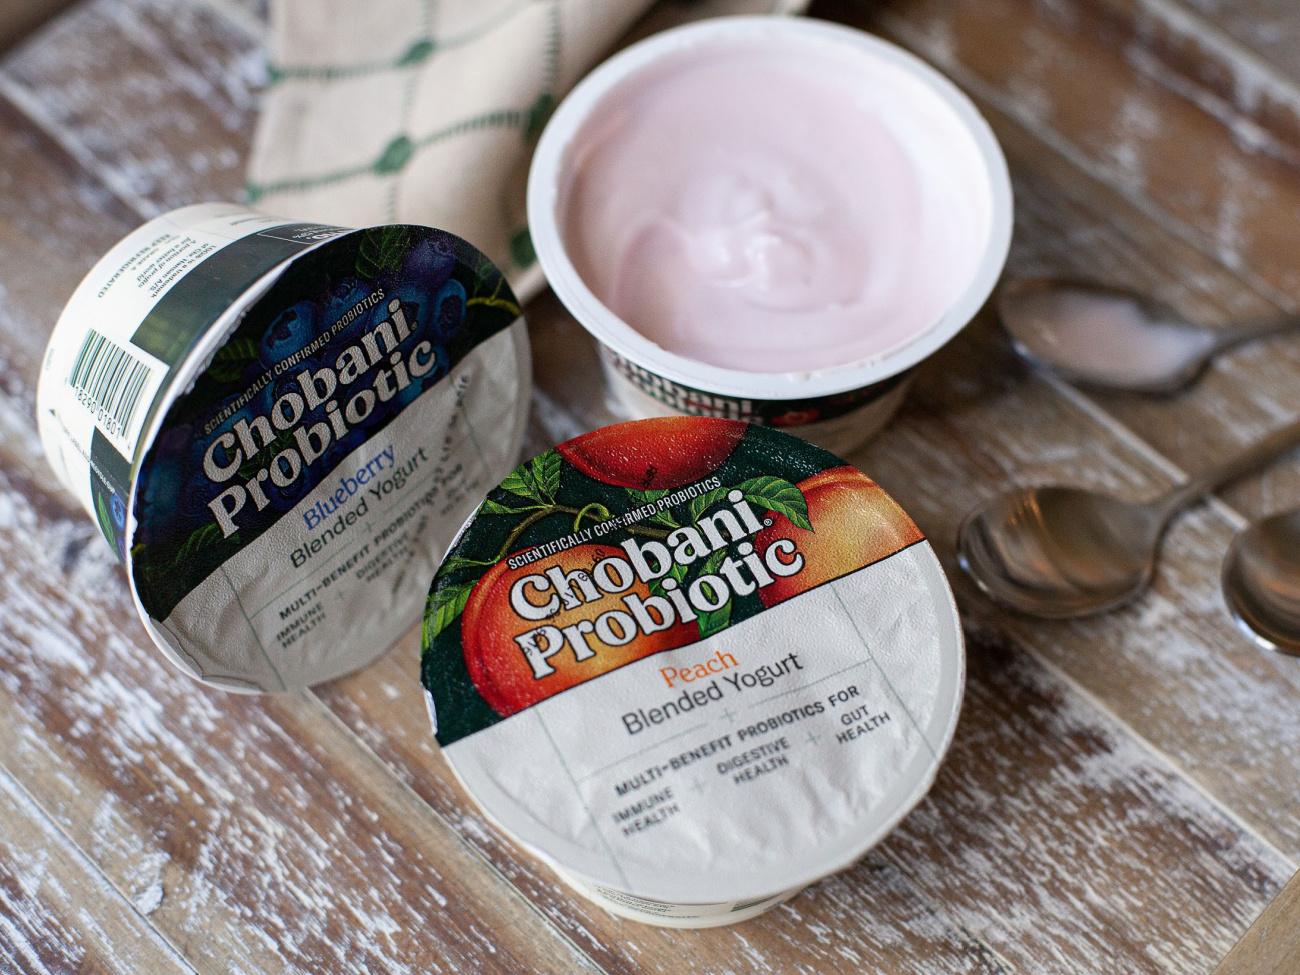 Chobani Probiotic Yogurt As Low As 13¢ Per Cup At Publix on I Heart Publix